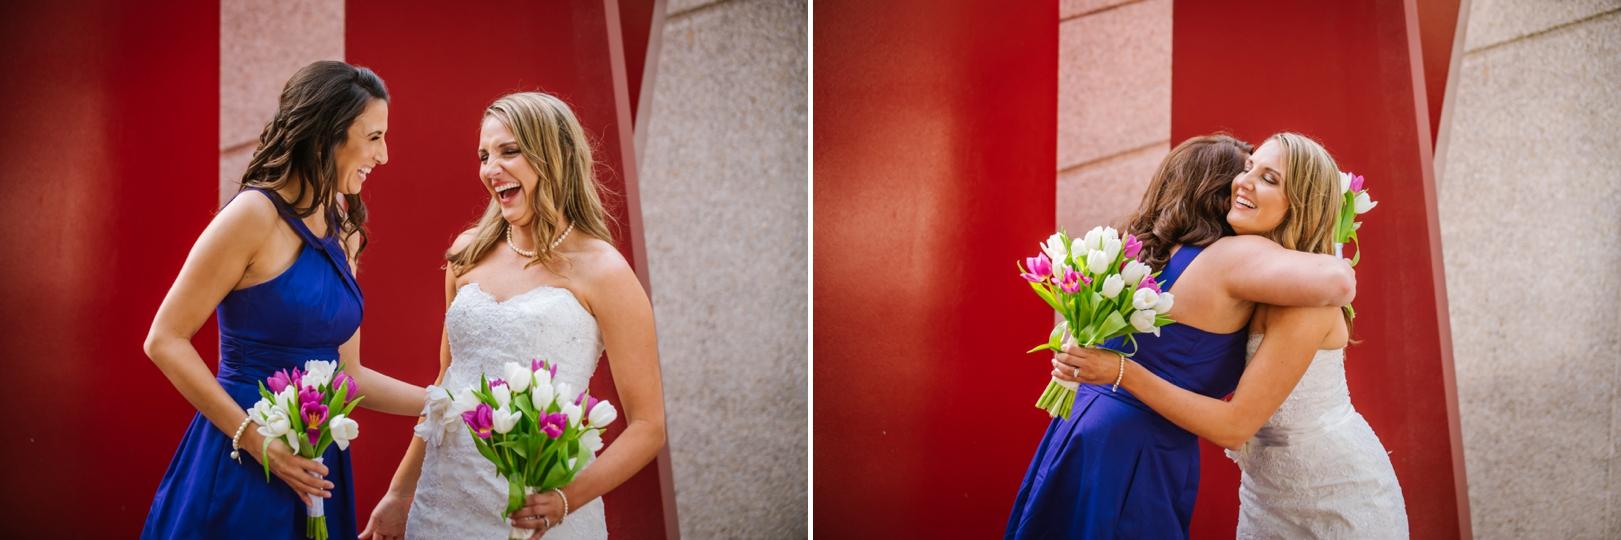 tampa-modern-traditional-wedding-photography_0010.jpg